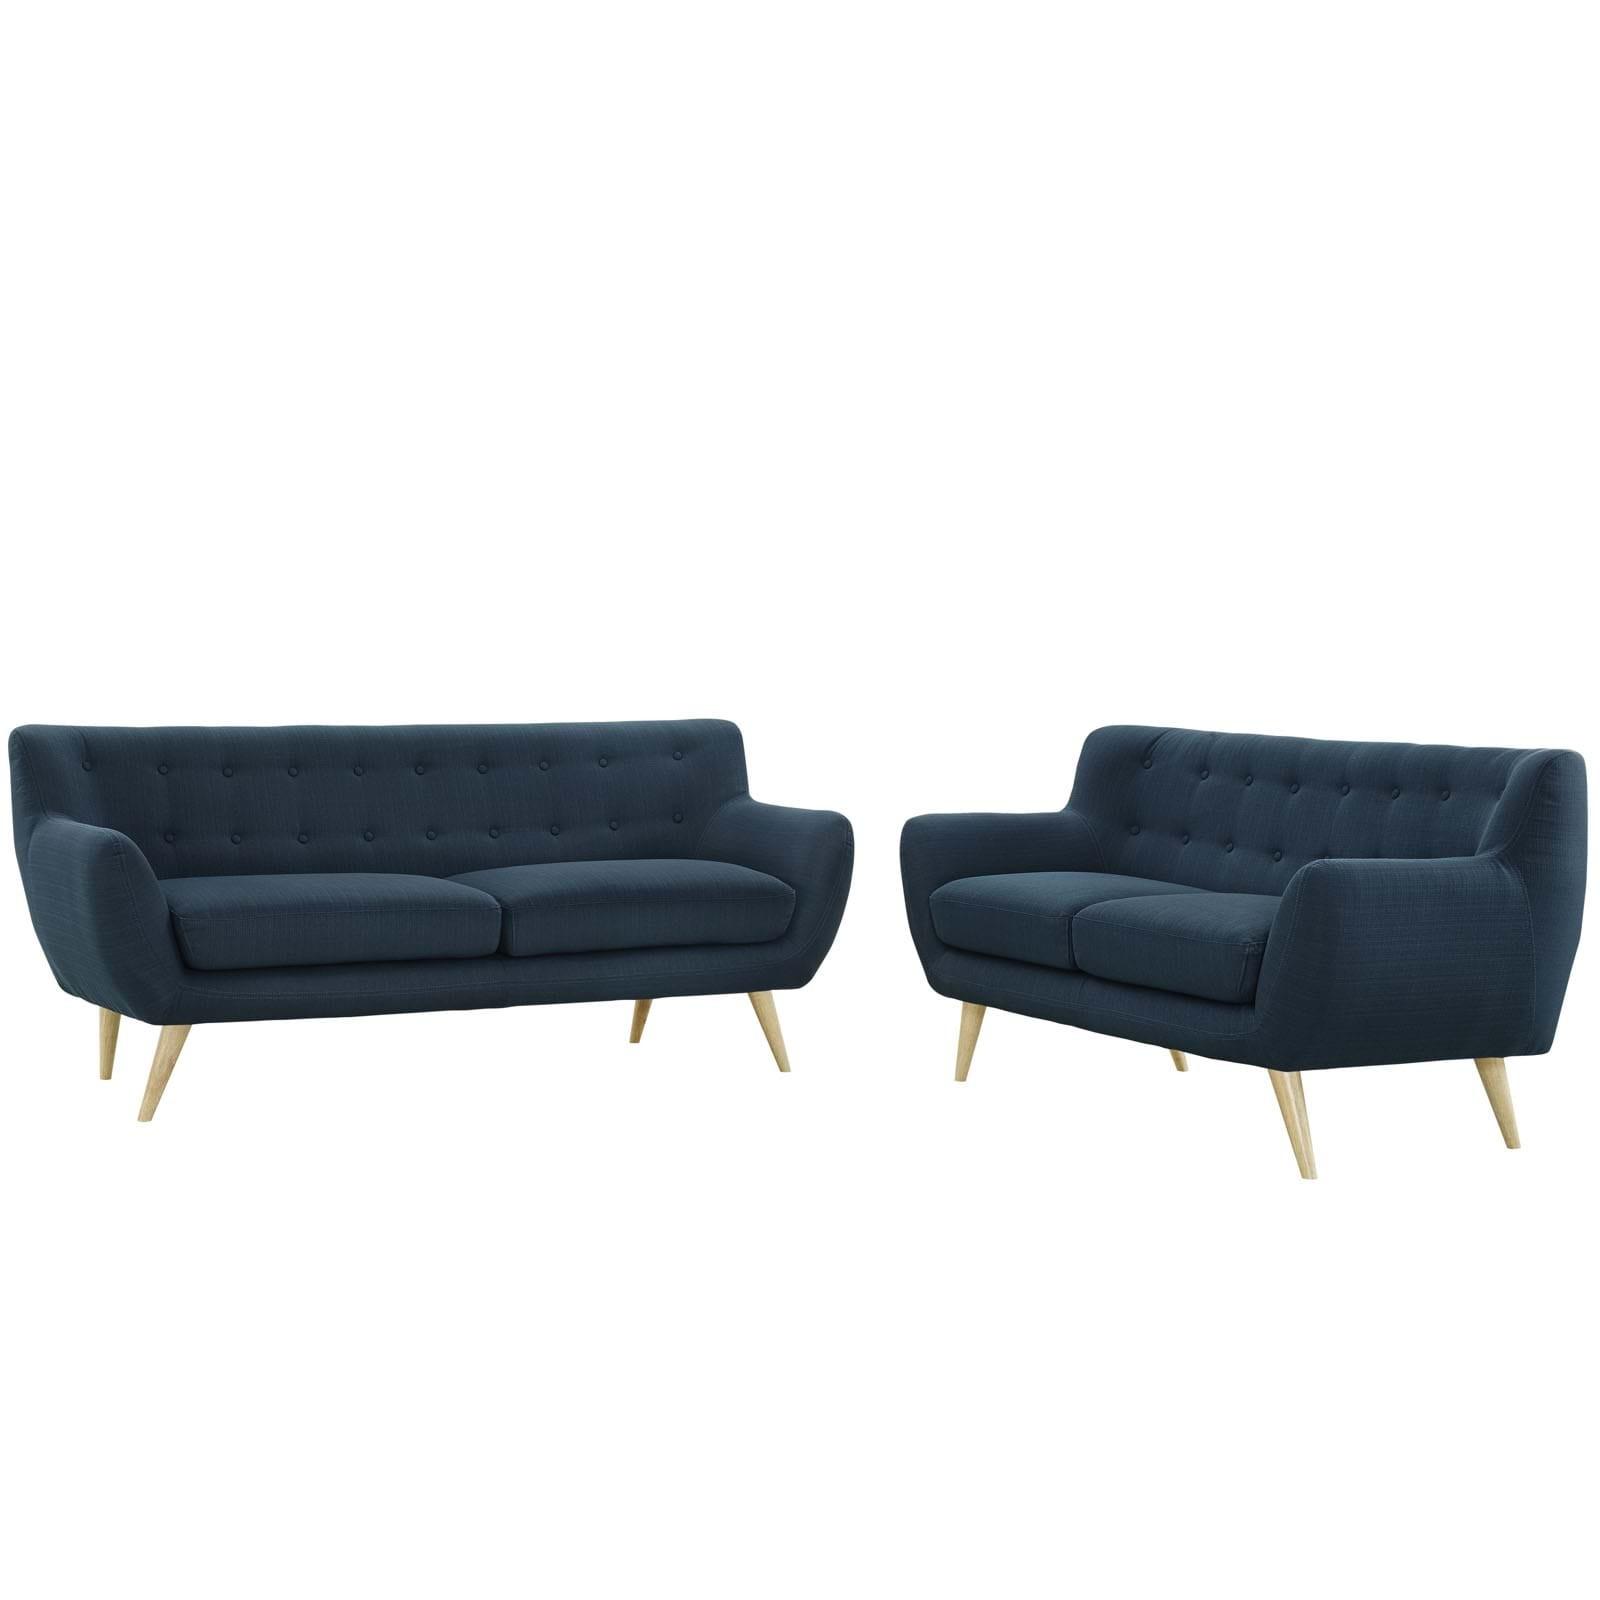 Remark Living Room Set (2 Piece)